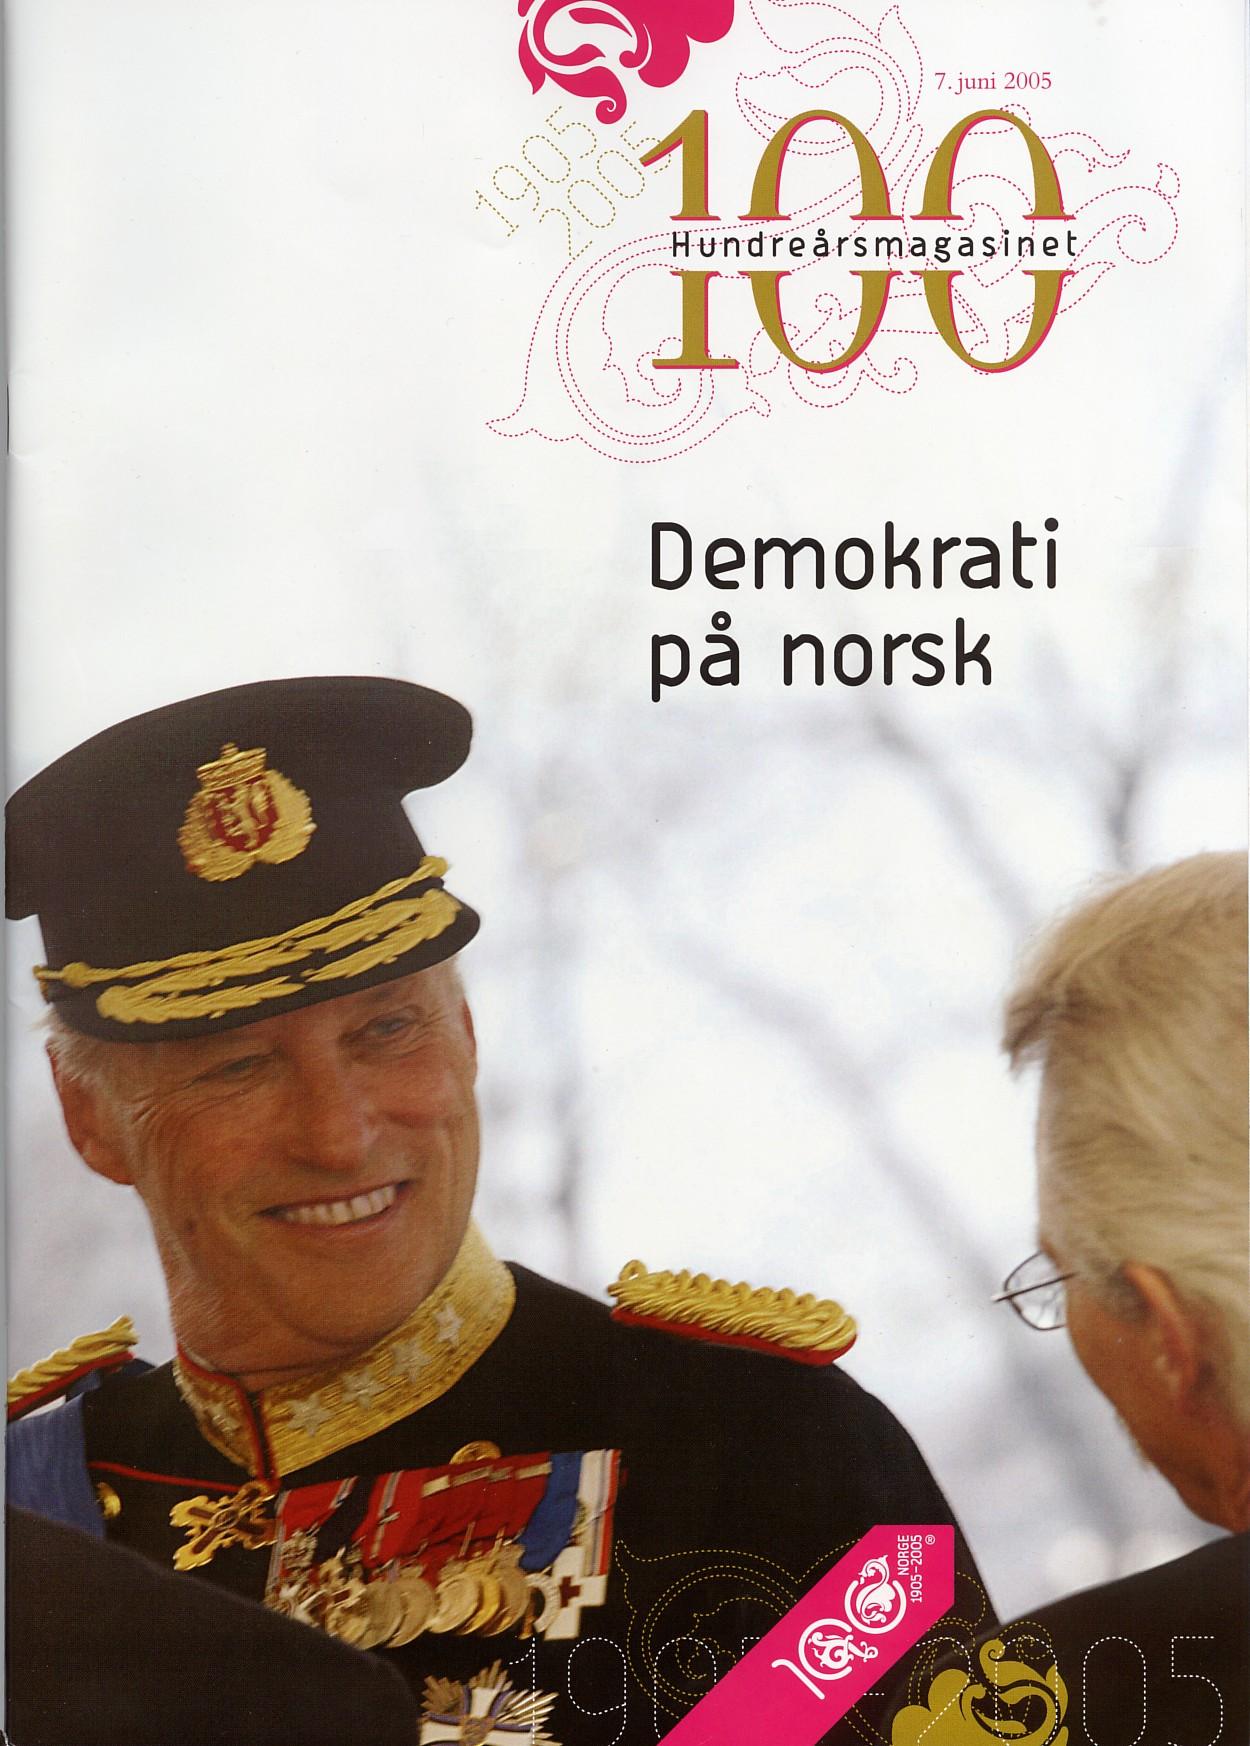 Hundreårsmagasinet – Demokrati på norsk